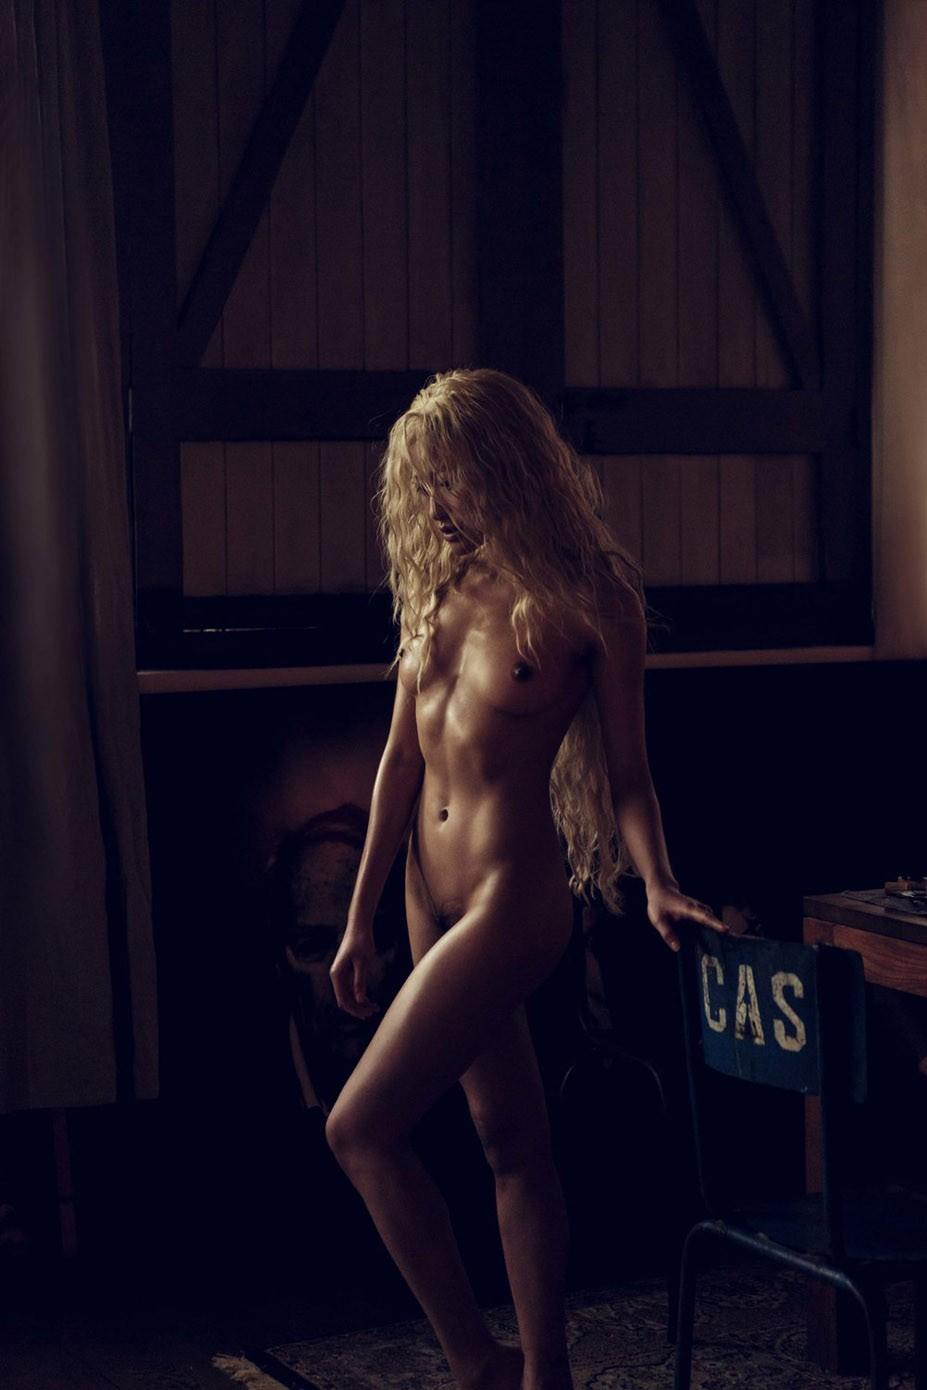 Sheri Chiu nude by Remi Kozdra and Kasia Baczulis - Rekt Magazine